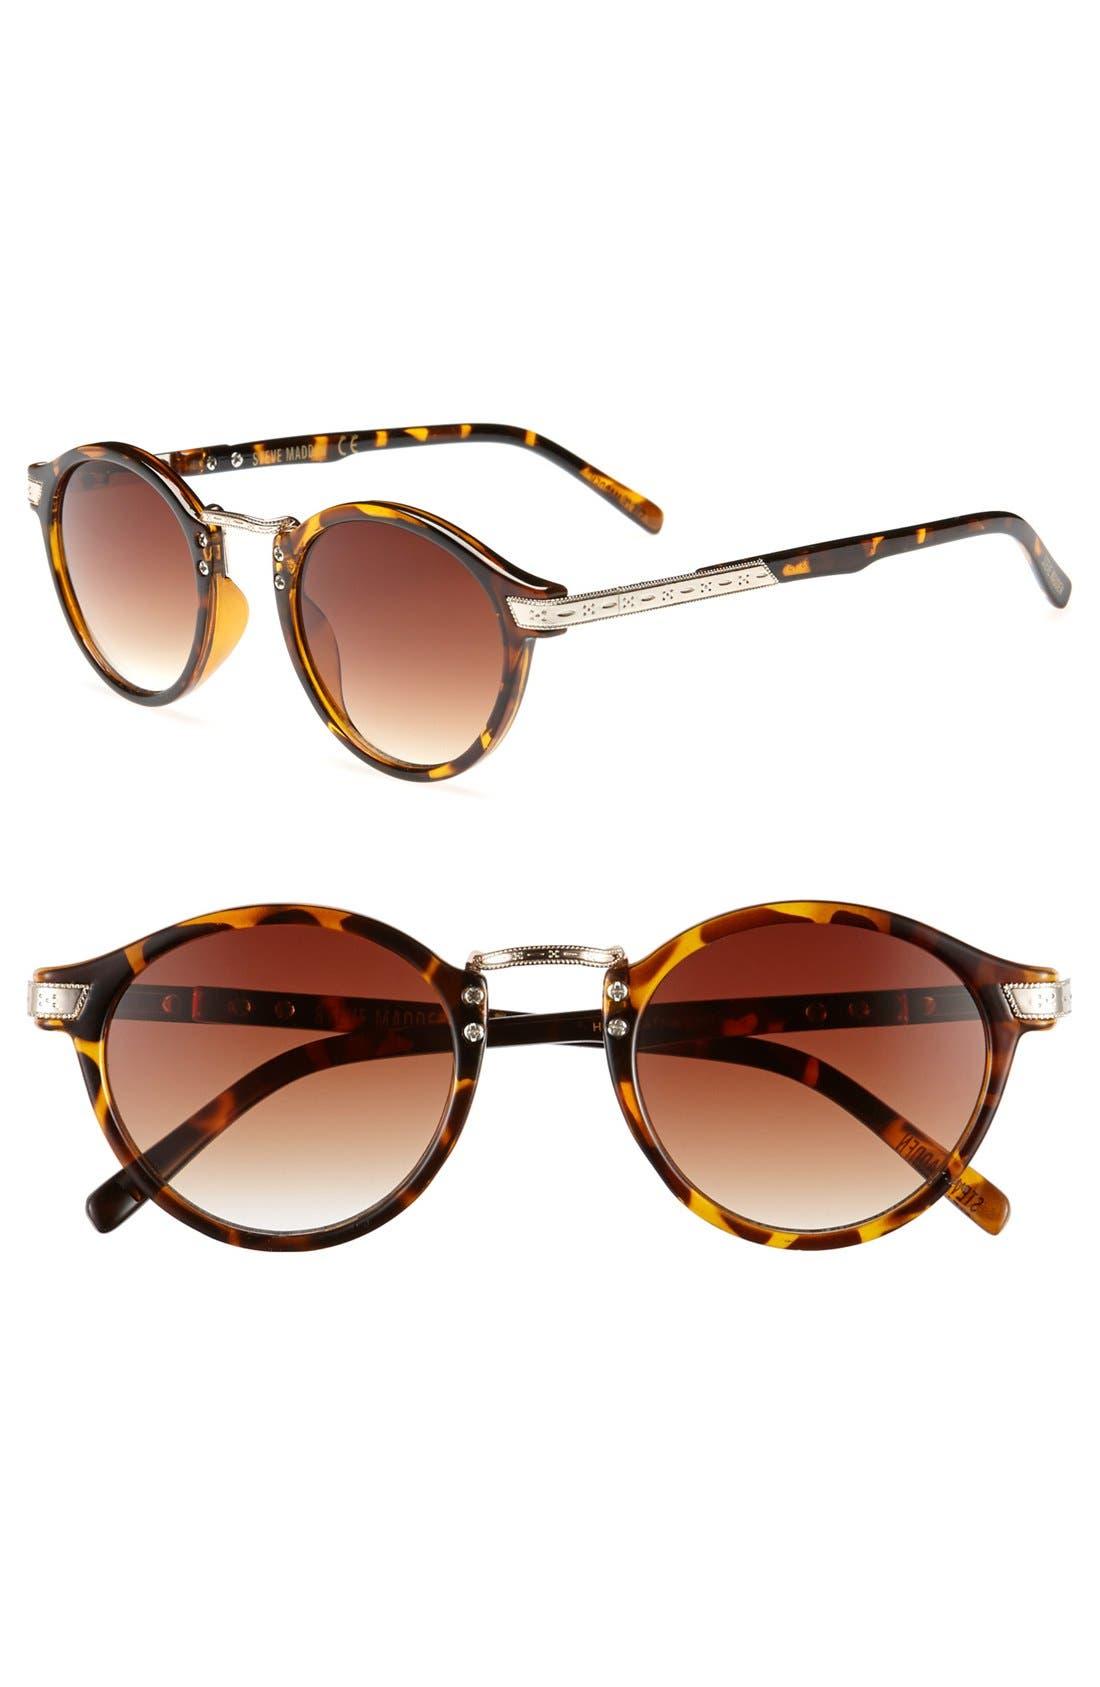 Main Image - Steve Madden 45mm Retro Sunglasses